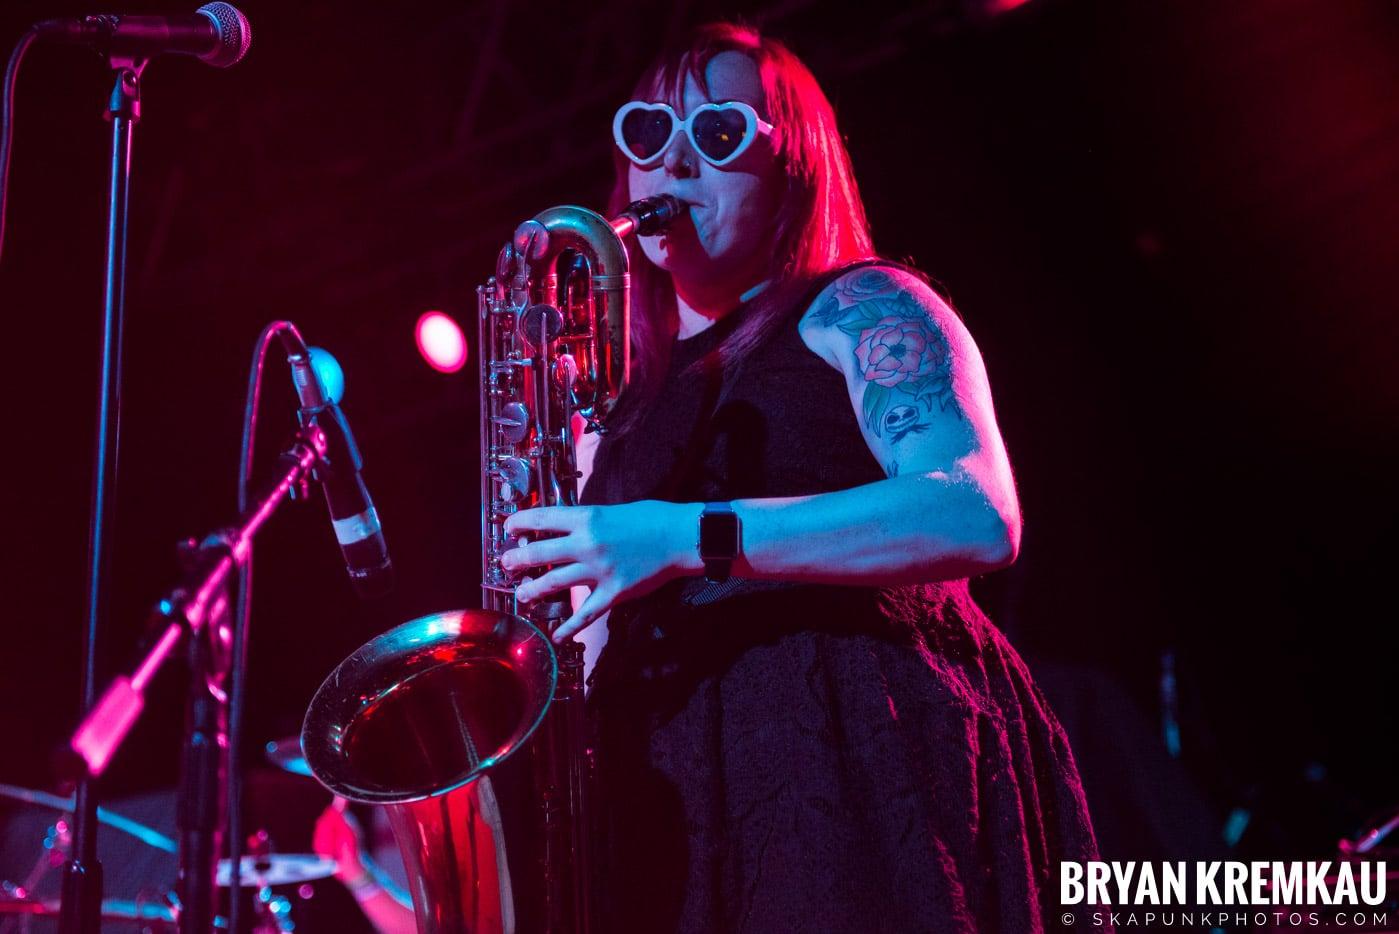 Backyard Superheroes @ Starland Ballroom, Sayreville, NJ - 7.29.17 (10)